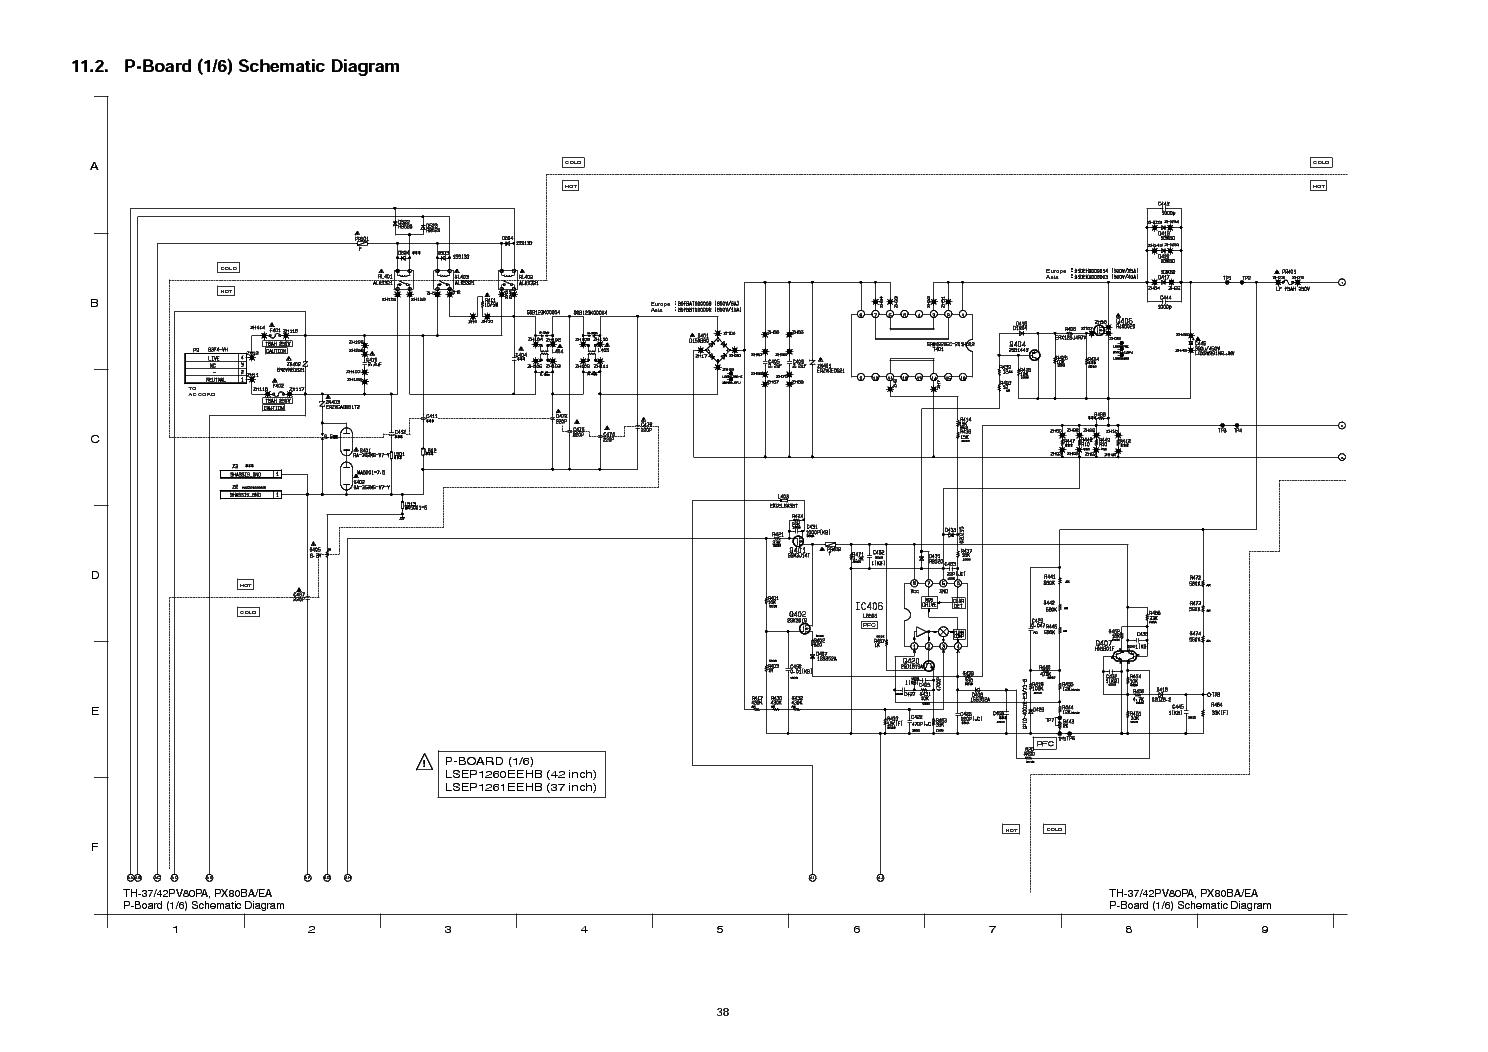 e55p dmr panasonic schematic diagram power supply board panasonic dvd-s75 power supply sch service manual download ... block diagram power supply